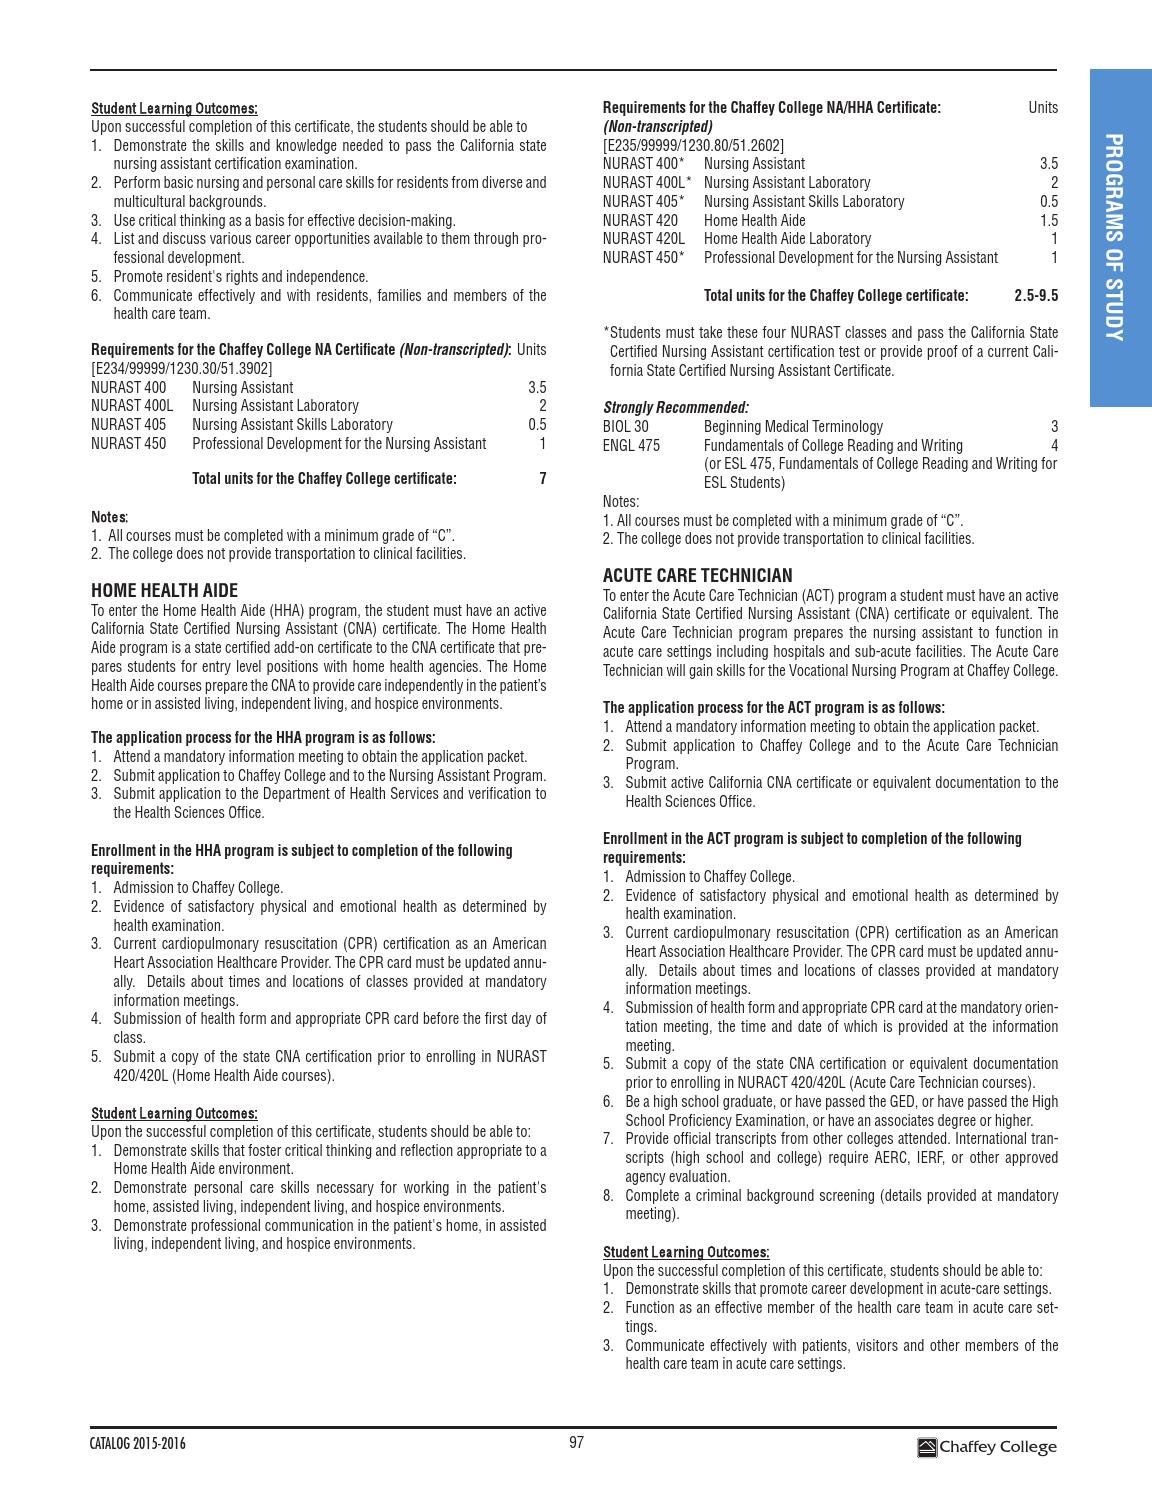 Home Health Aide License Verification California